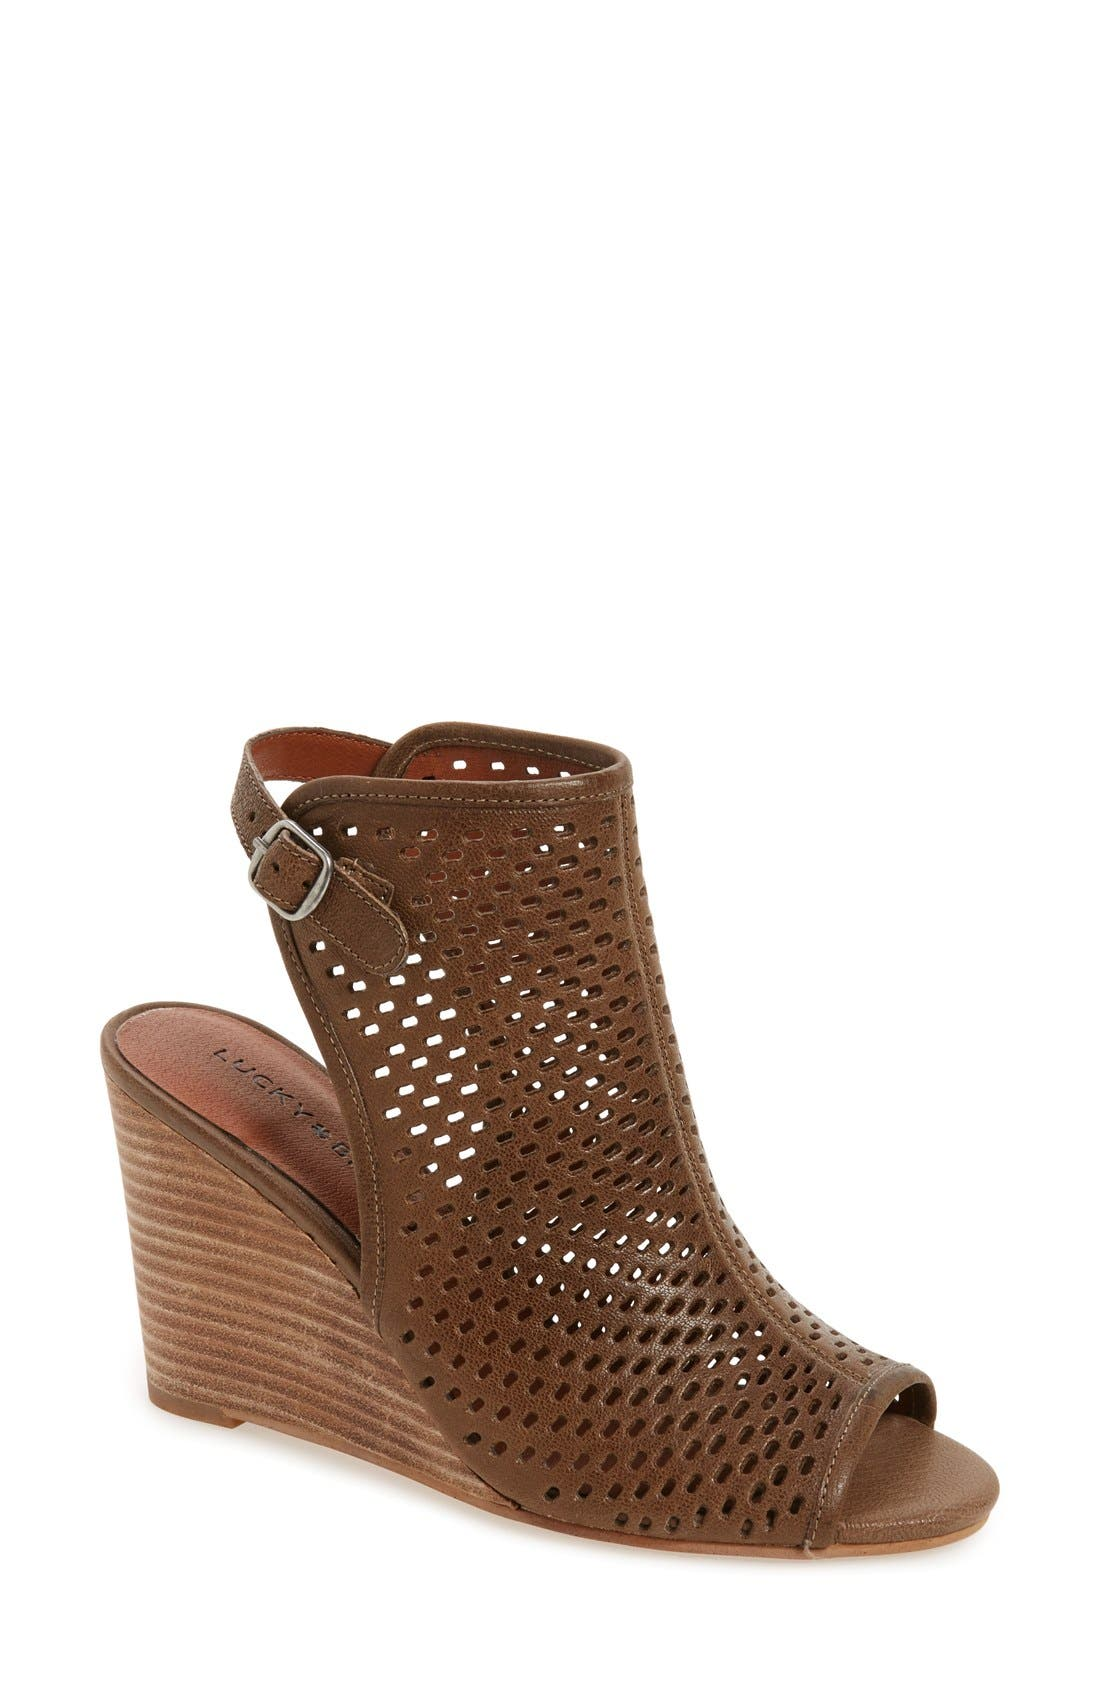 Main Image - Lucky Brand 'Rozina' Cutout Wedge Sandal (Women)